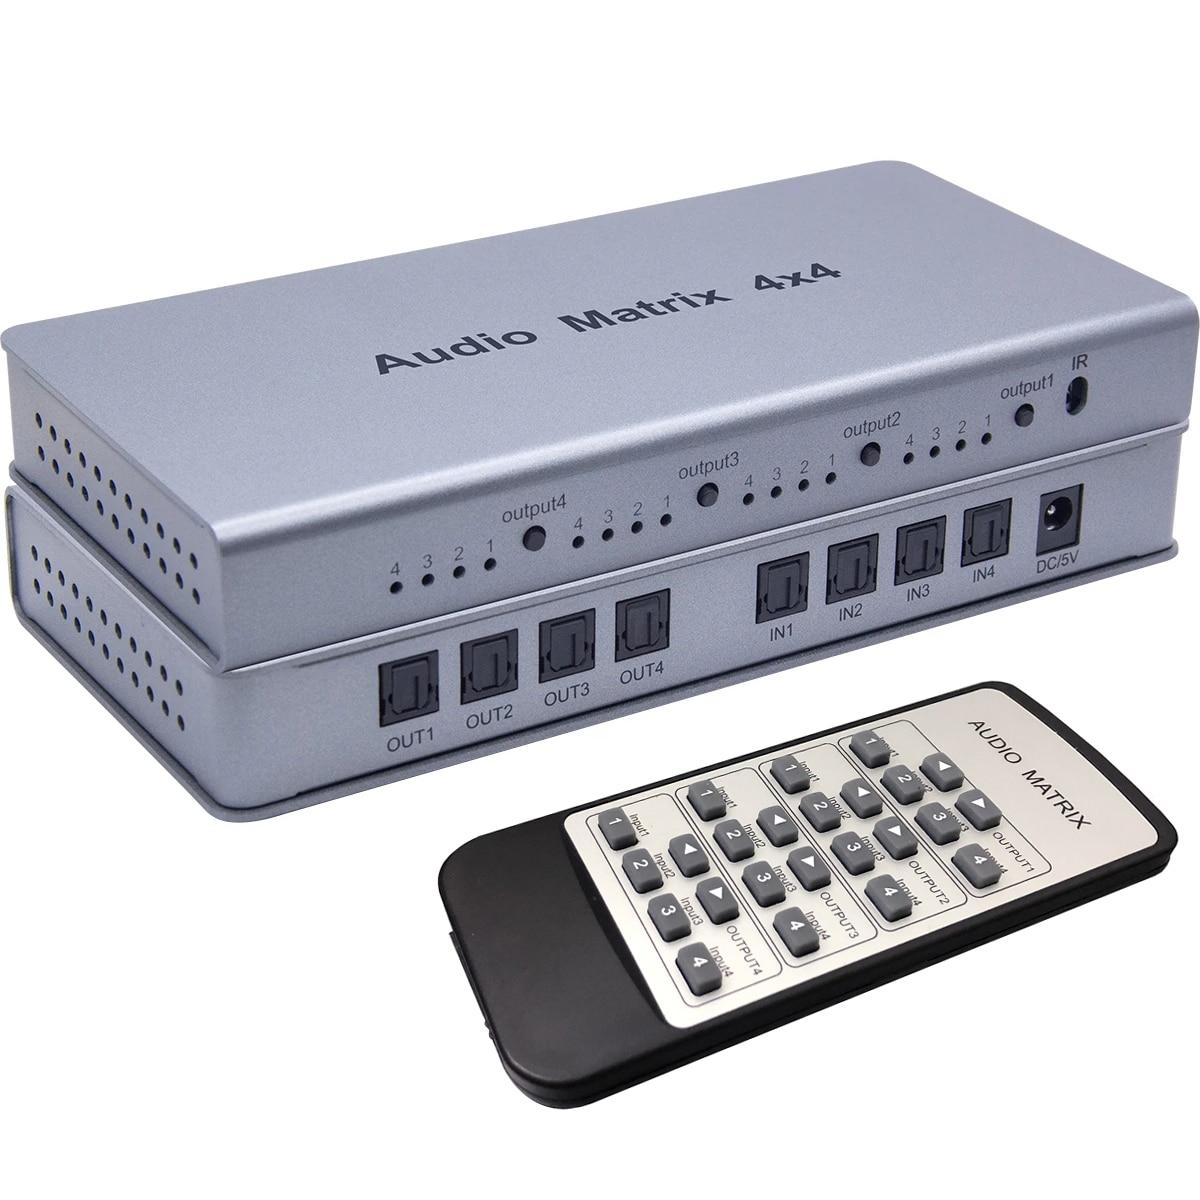 4x4 مصفوفة الصوت التبديل الجلاد الخائن SPDIF /TOSLINK الرقمية البصرية محول صوت 4x4 صحيح مصفوفة محدد 4 في إلى 4 خارج